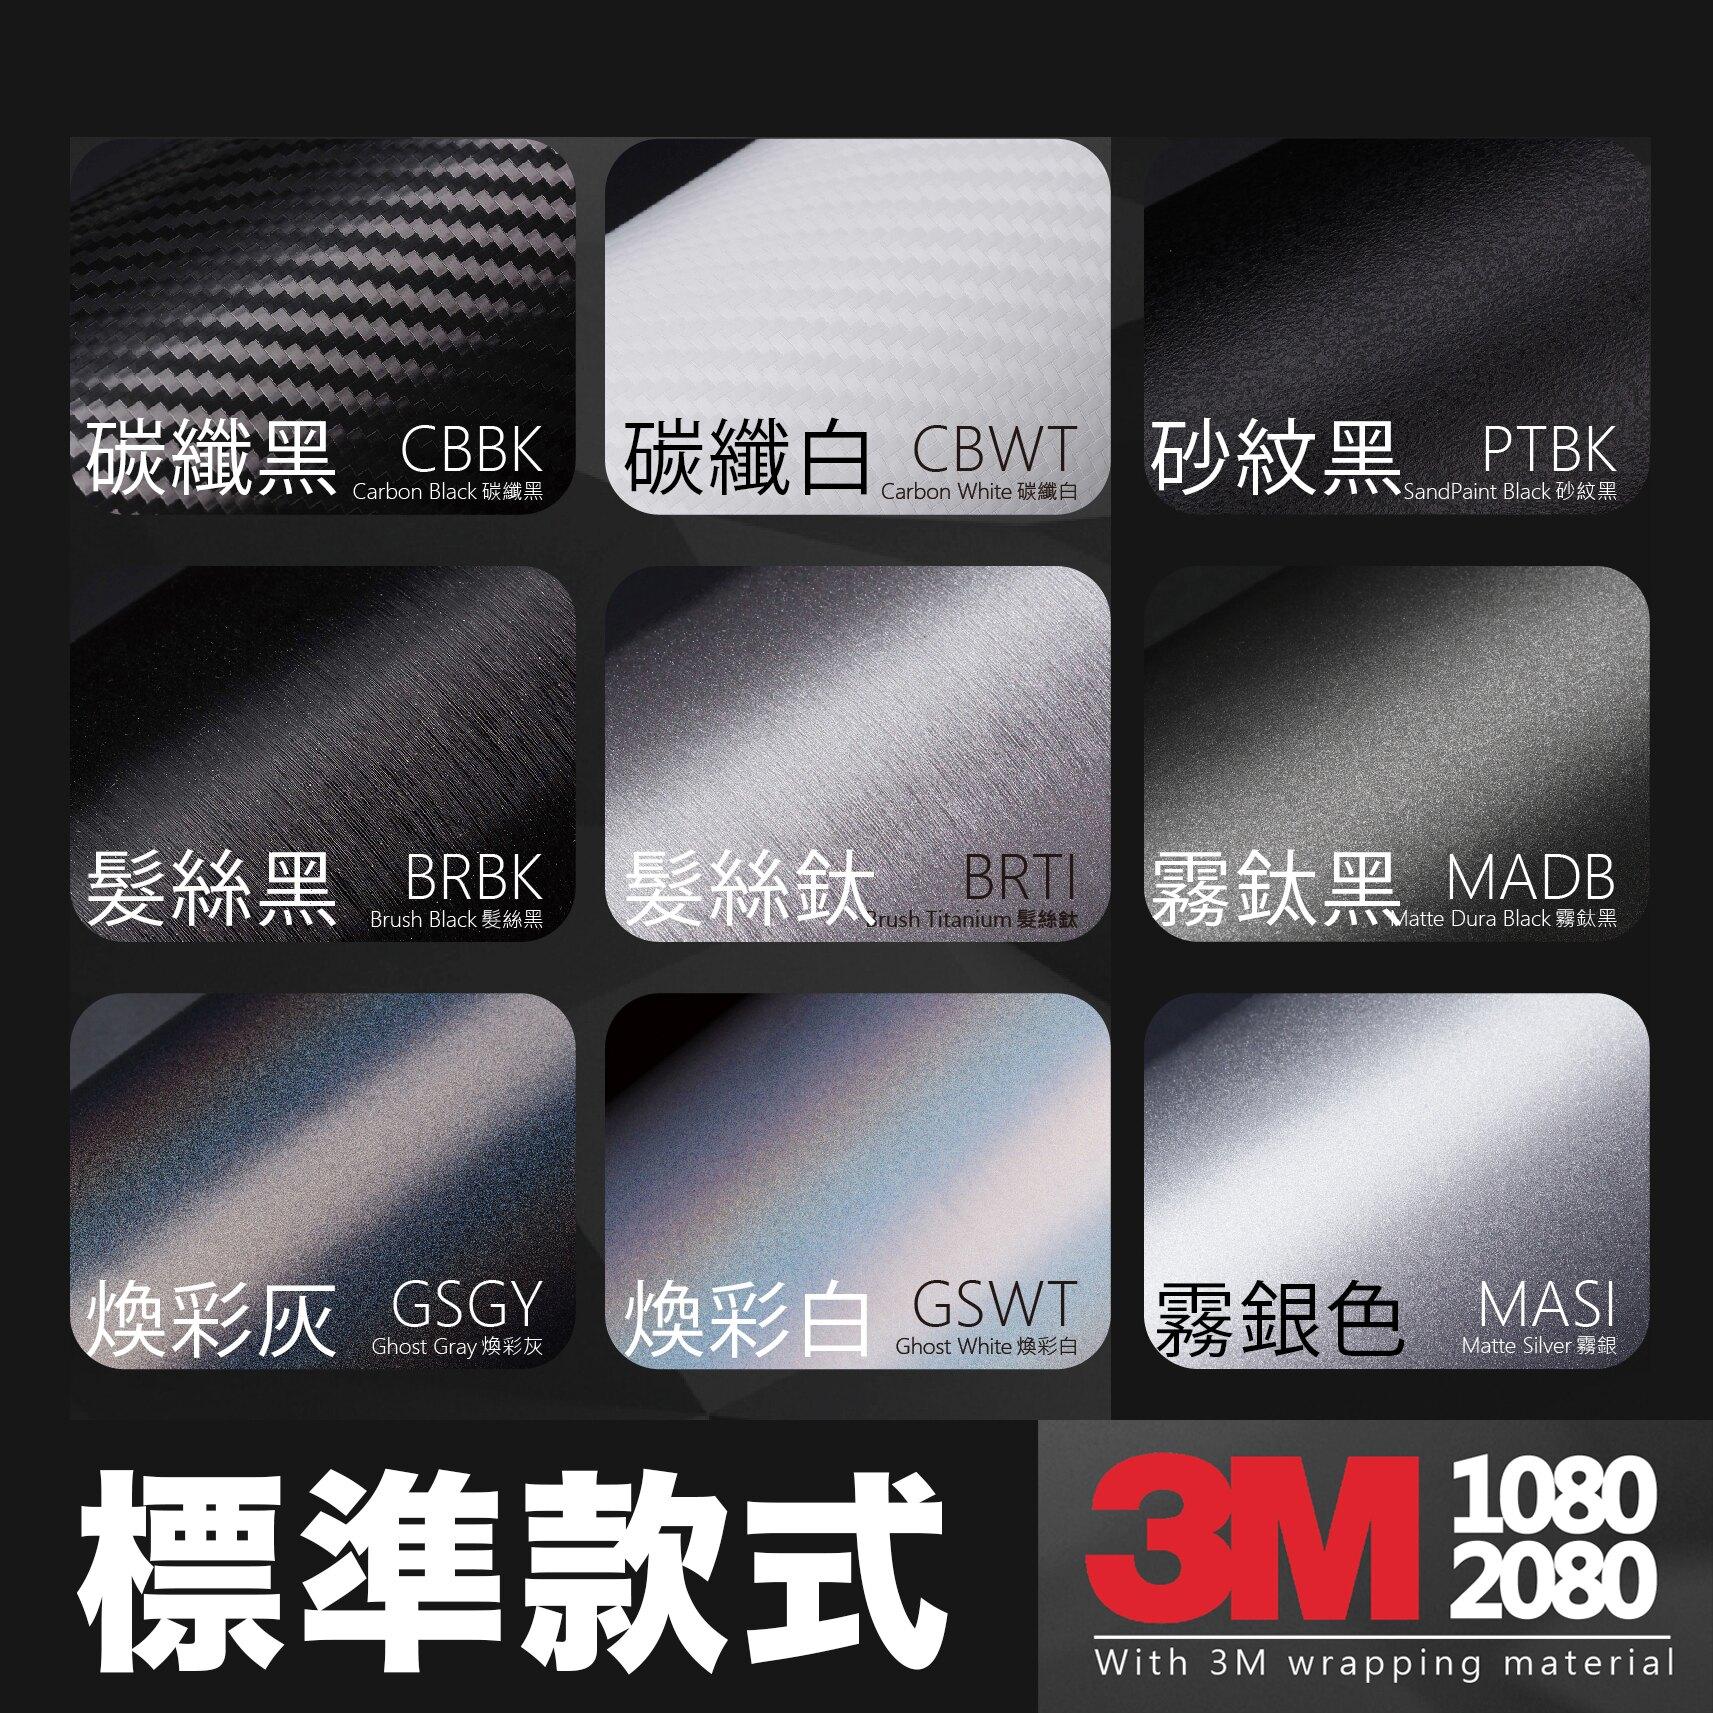 LIFE+GUARD 相機 鏡頭 包膜 SONY FE 100-400mm F4.5-5.6 GM  (標準款式)